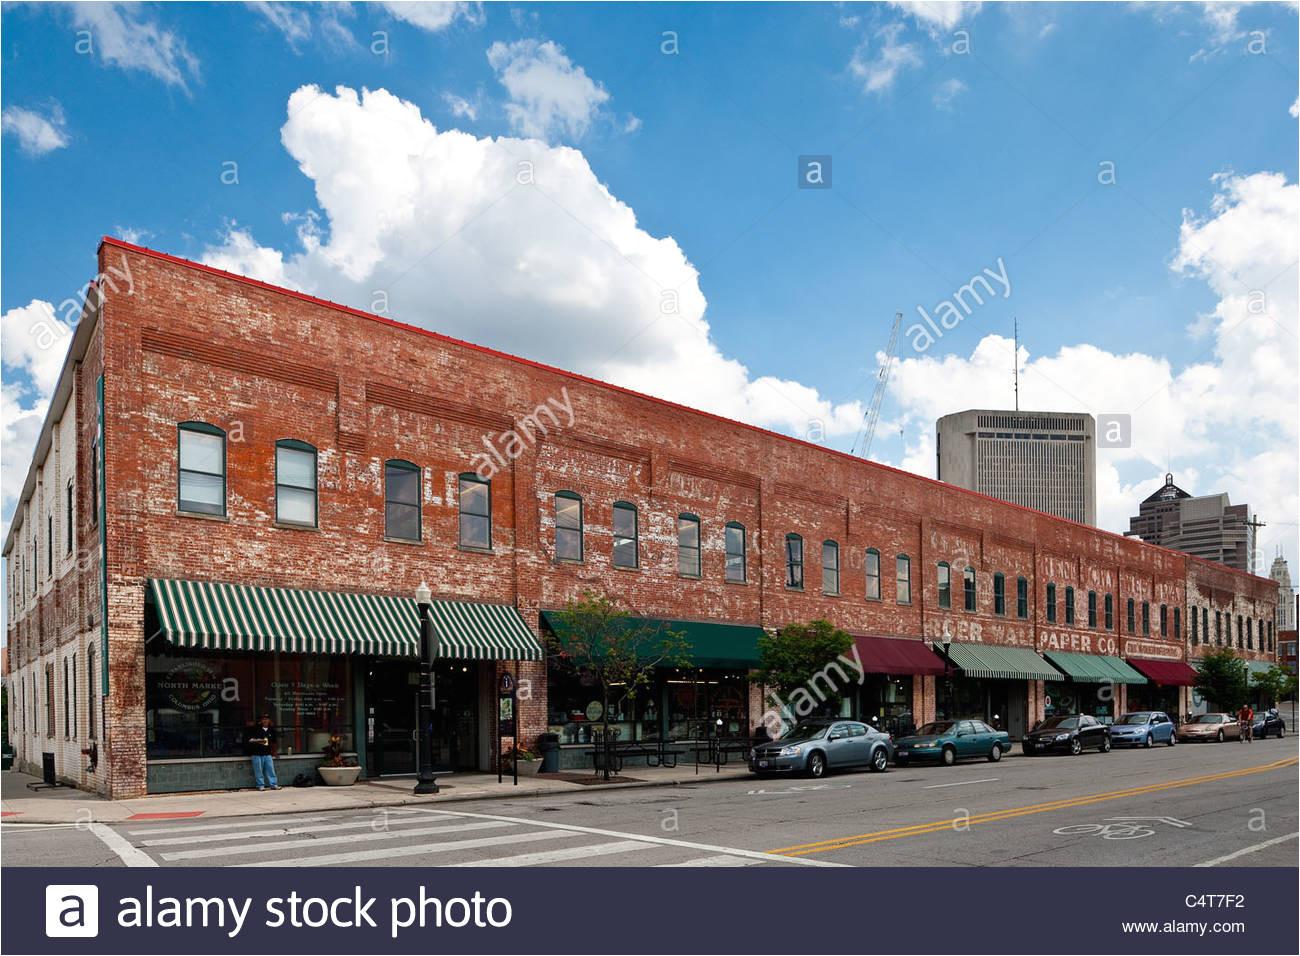 north market building located in the short north area of columbus ohio stock image